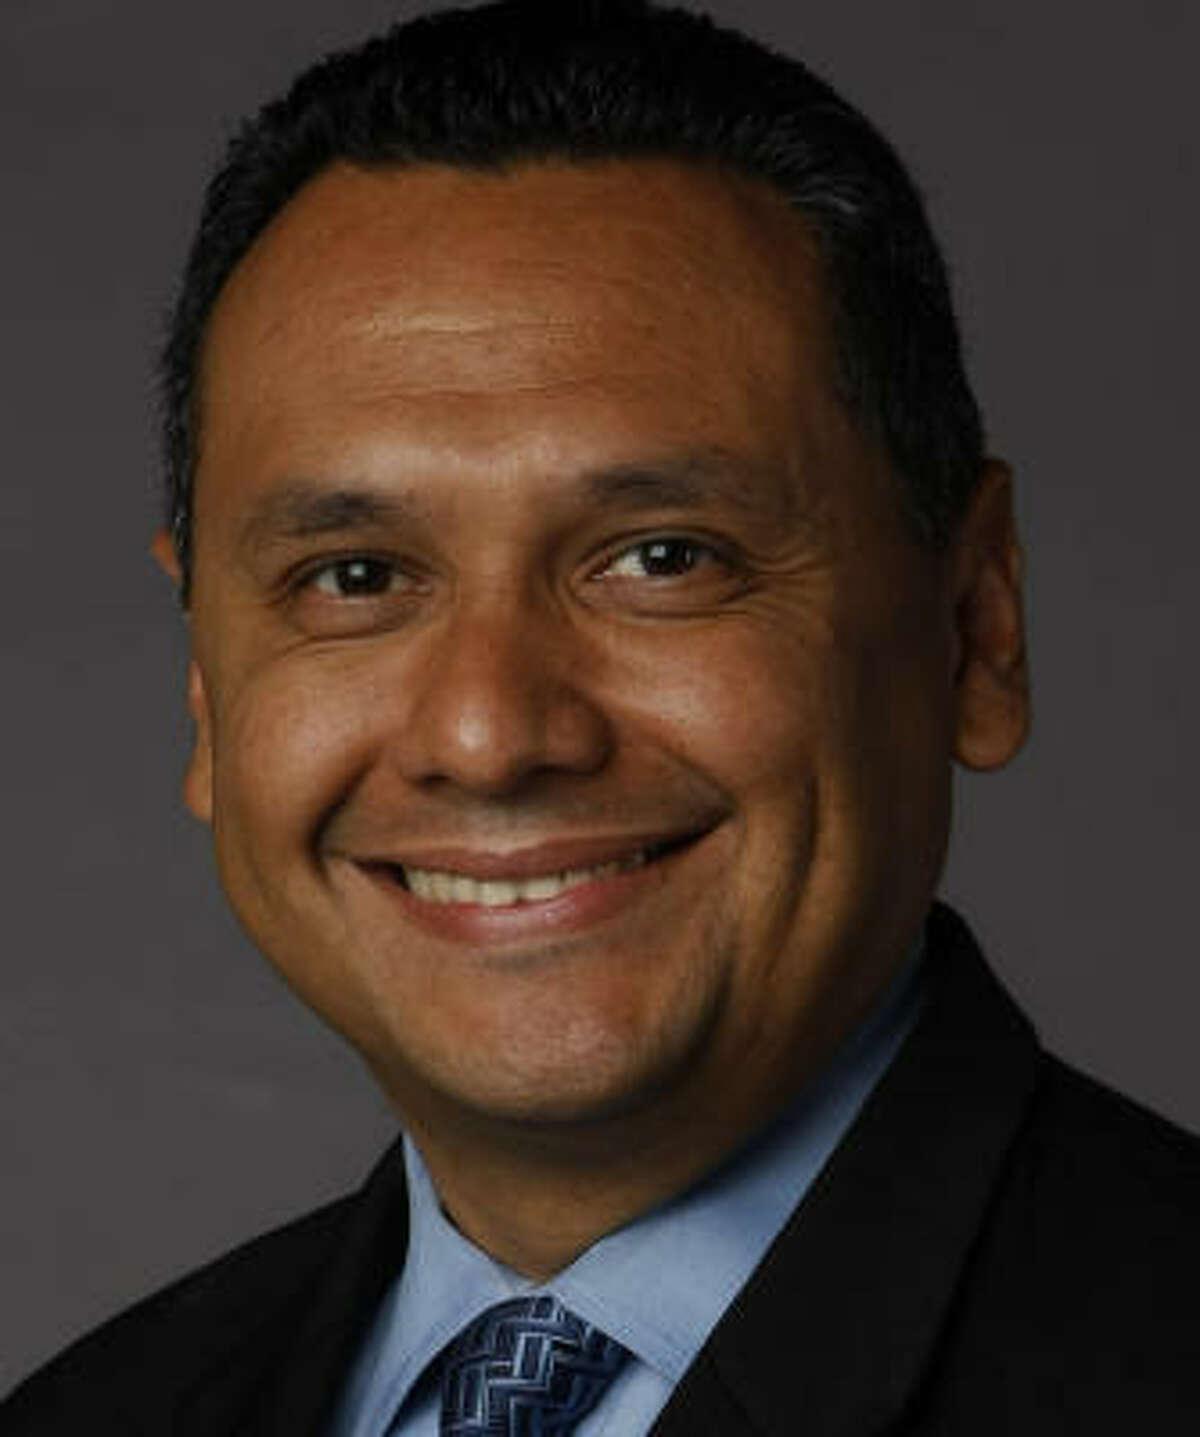 Candidate Ed Gonzalez